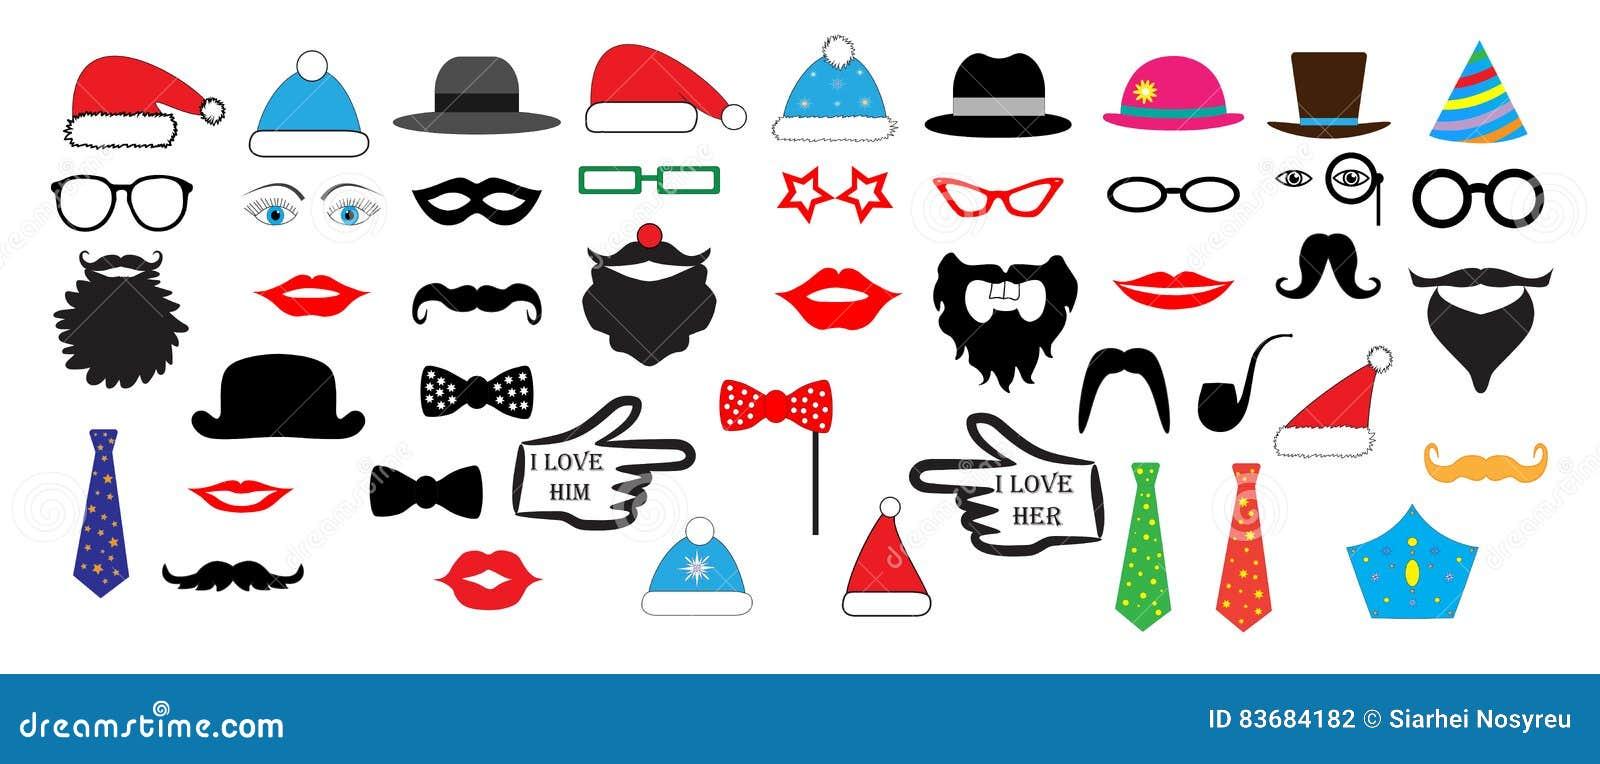 Christmas Retro Party set - Glasses, hats, lips, mustaches, masks